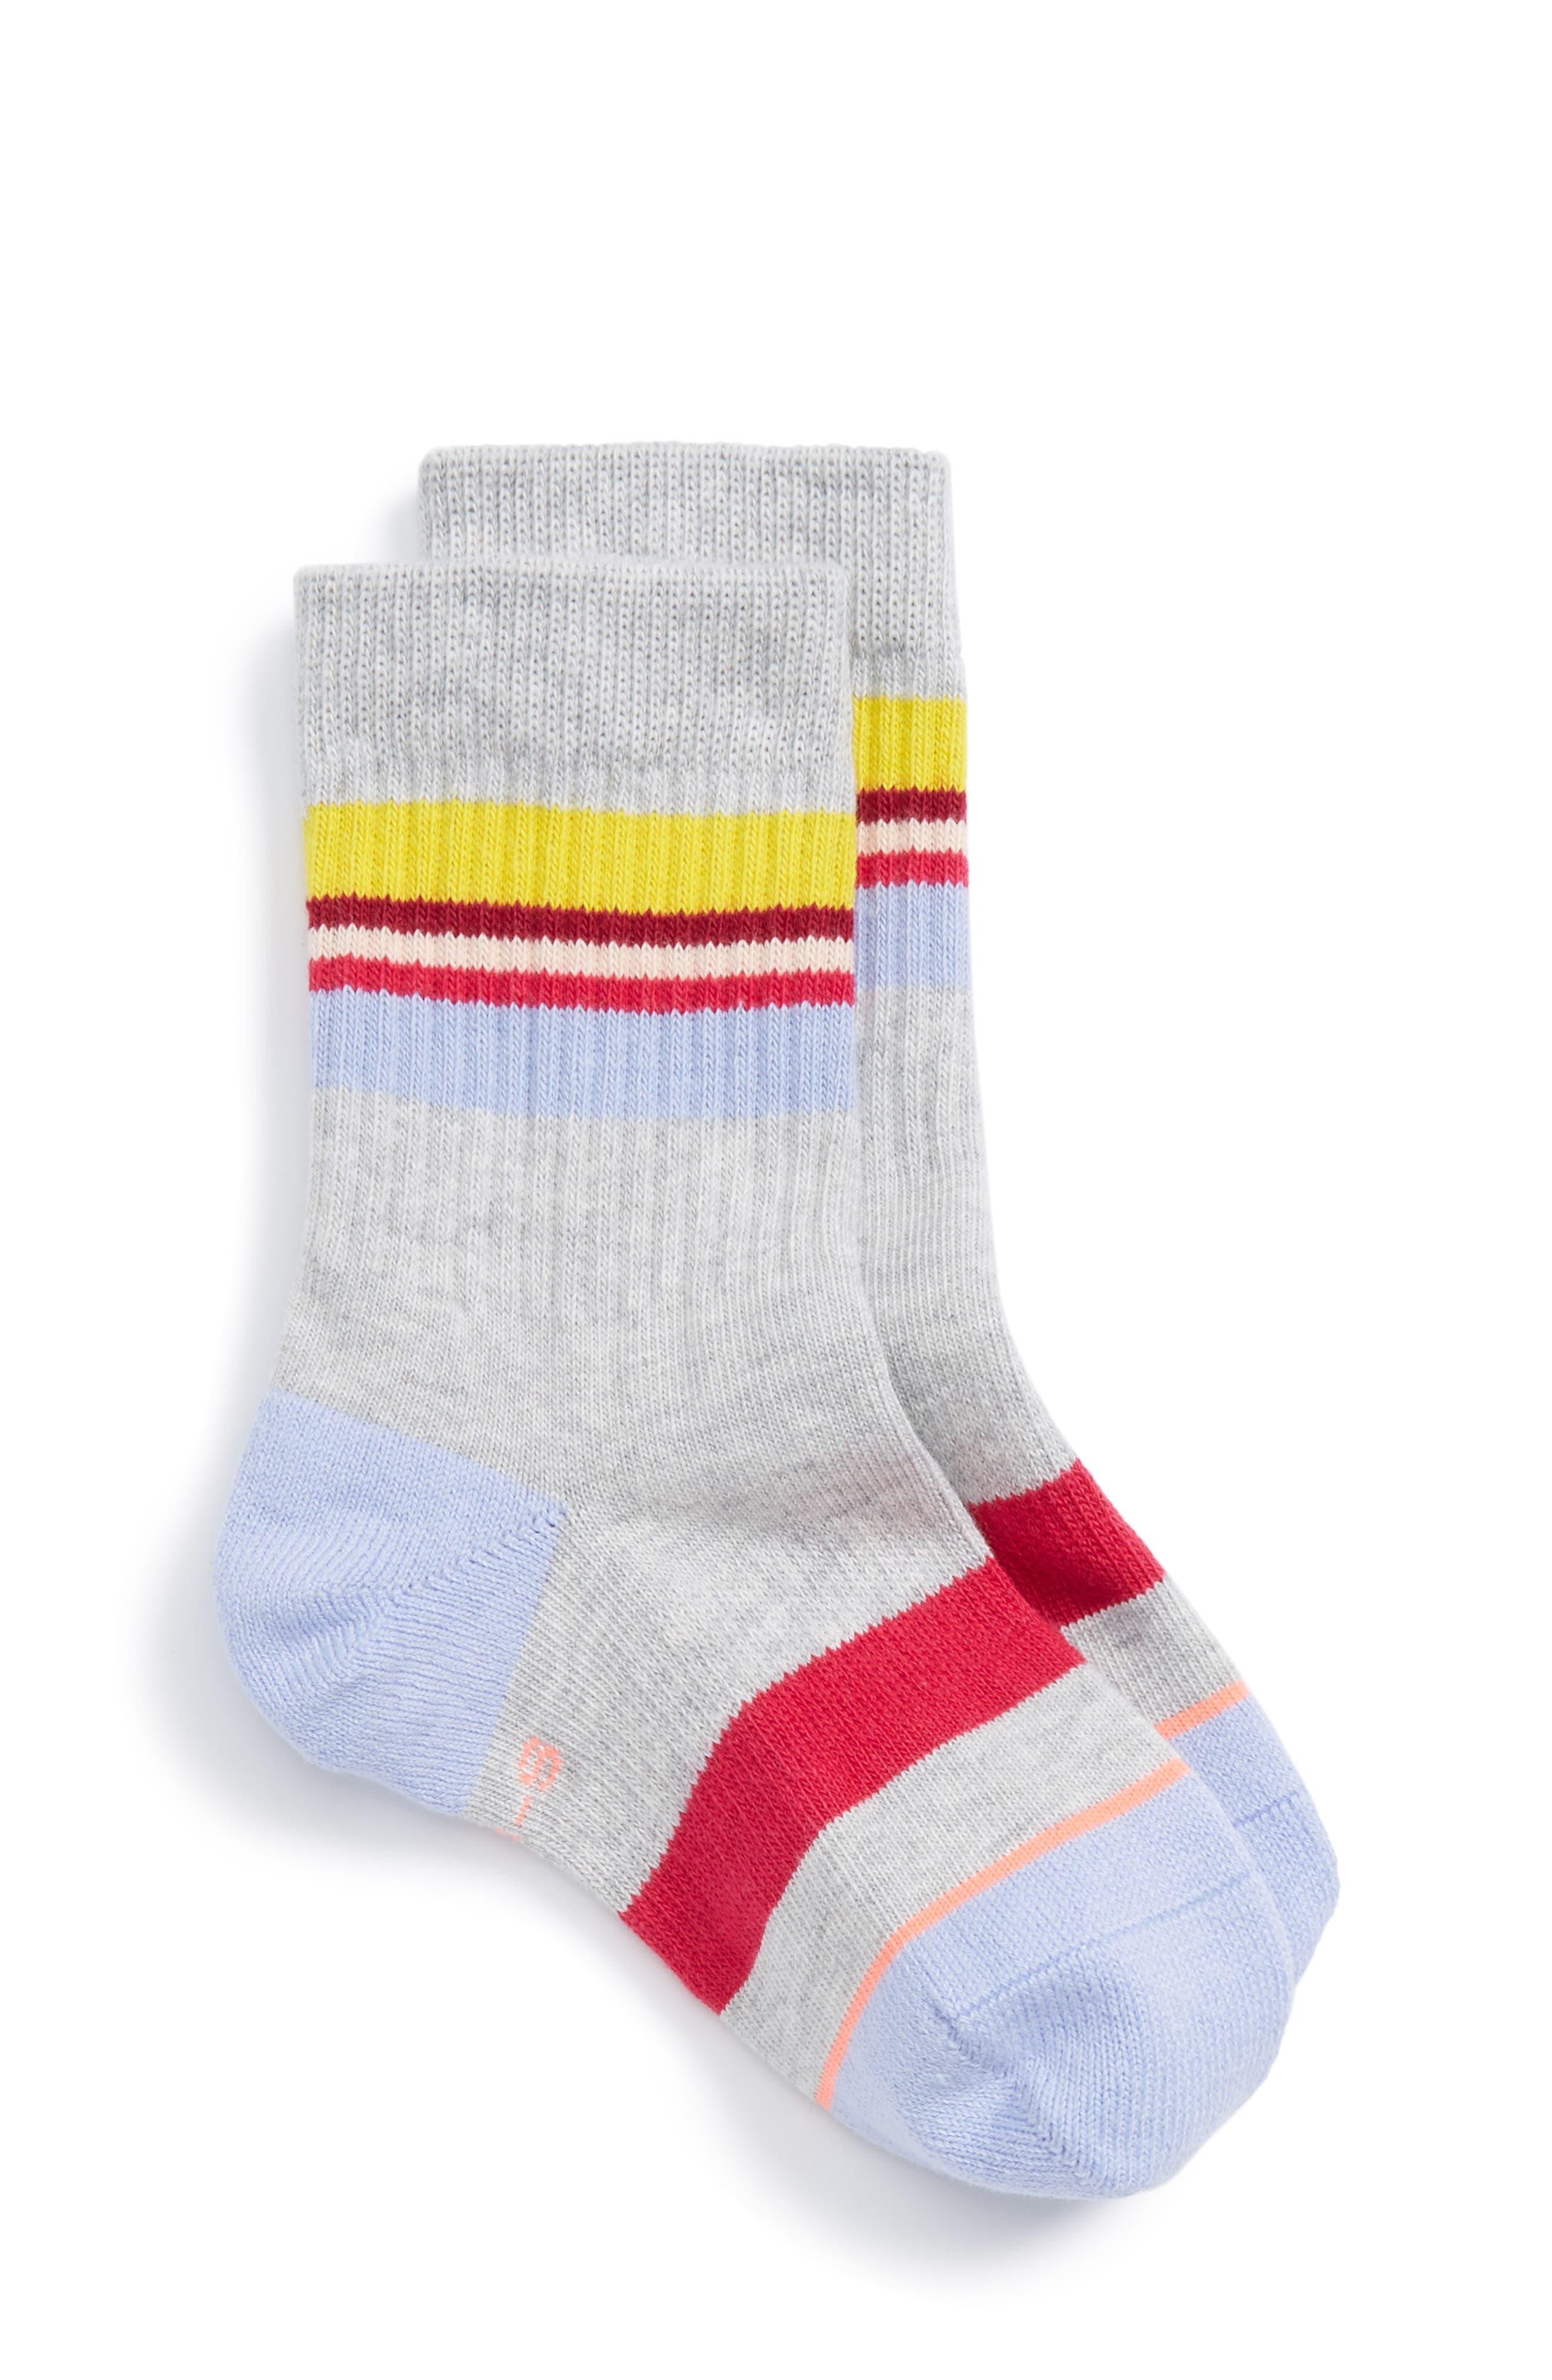 Jiggy Striped Socks,                         Main,                         color, Grey